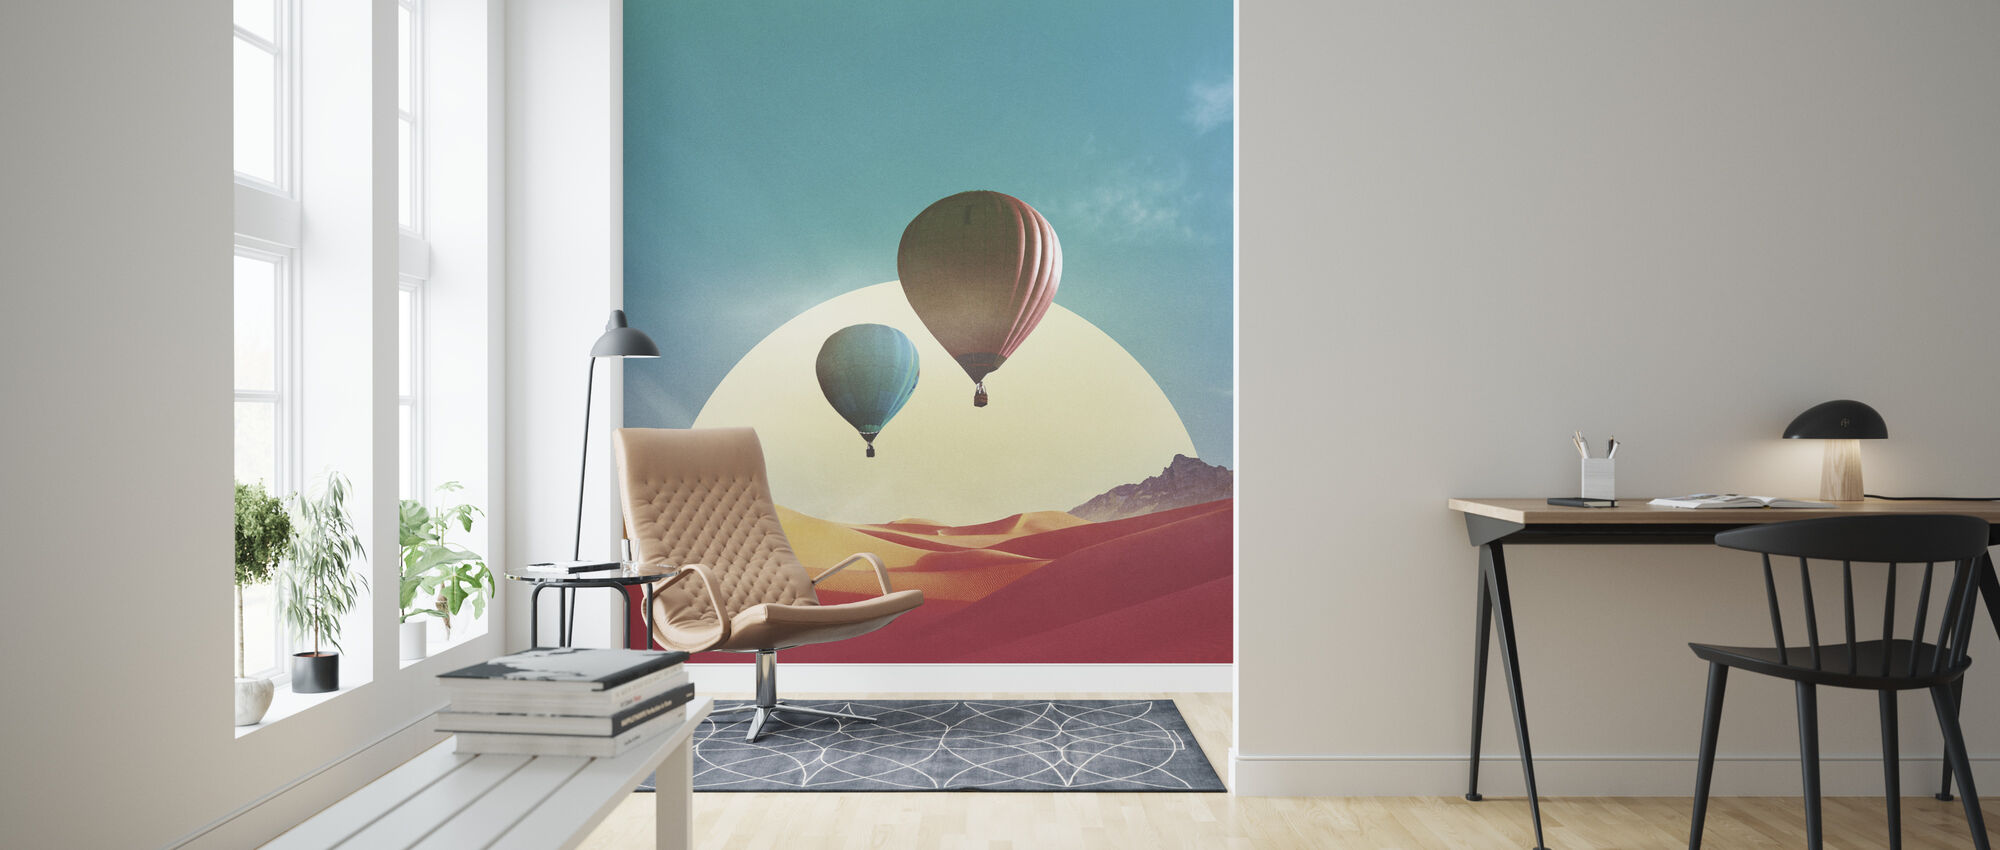 Stereolab - Wallpaper - Living Room